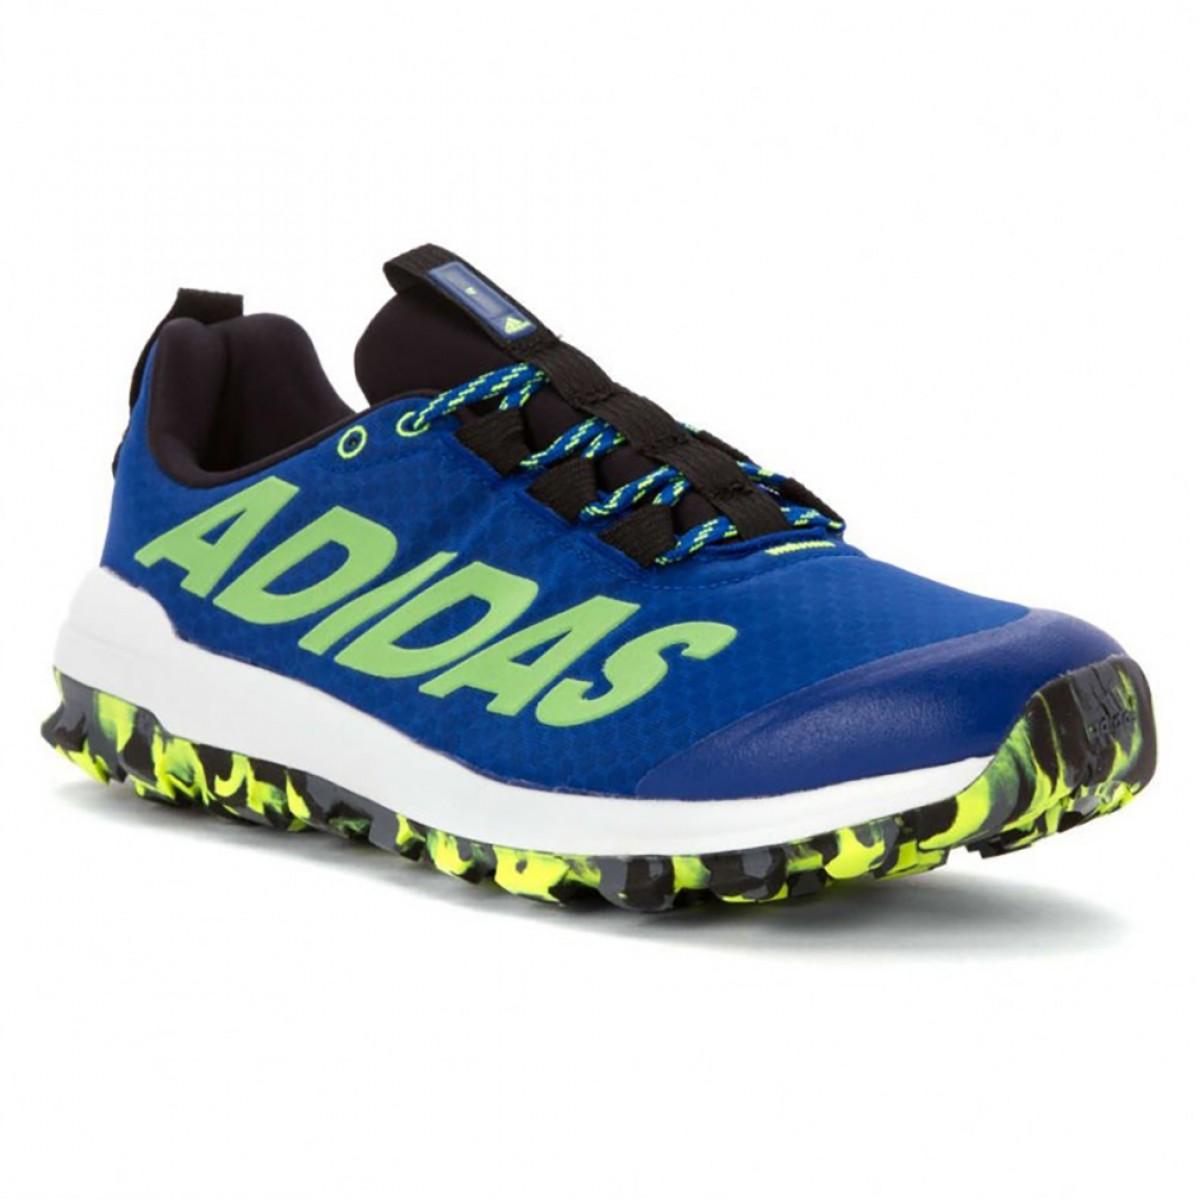 e3490bde36e Tênis Adidas Vigor 6 Tr Masculino Azul e Verde - Compre Agora ...